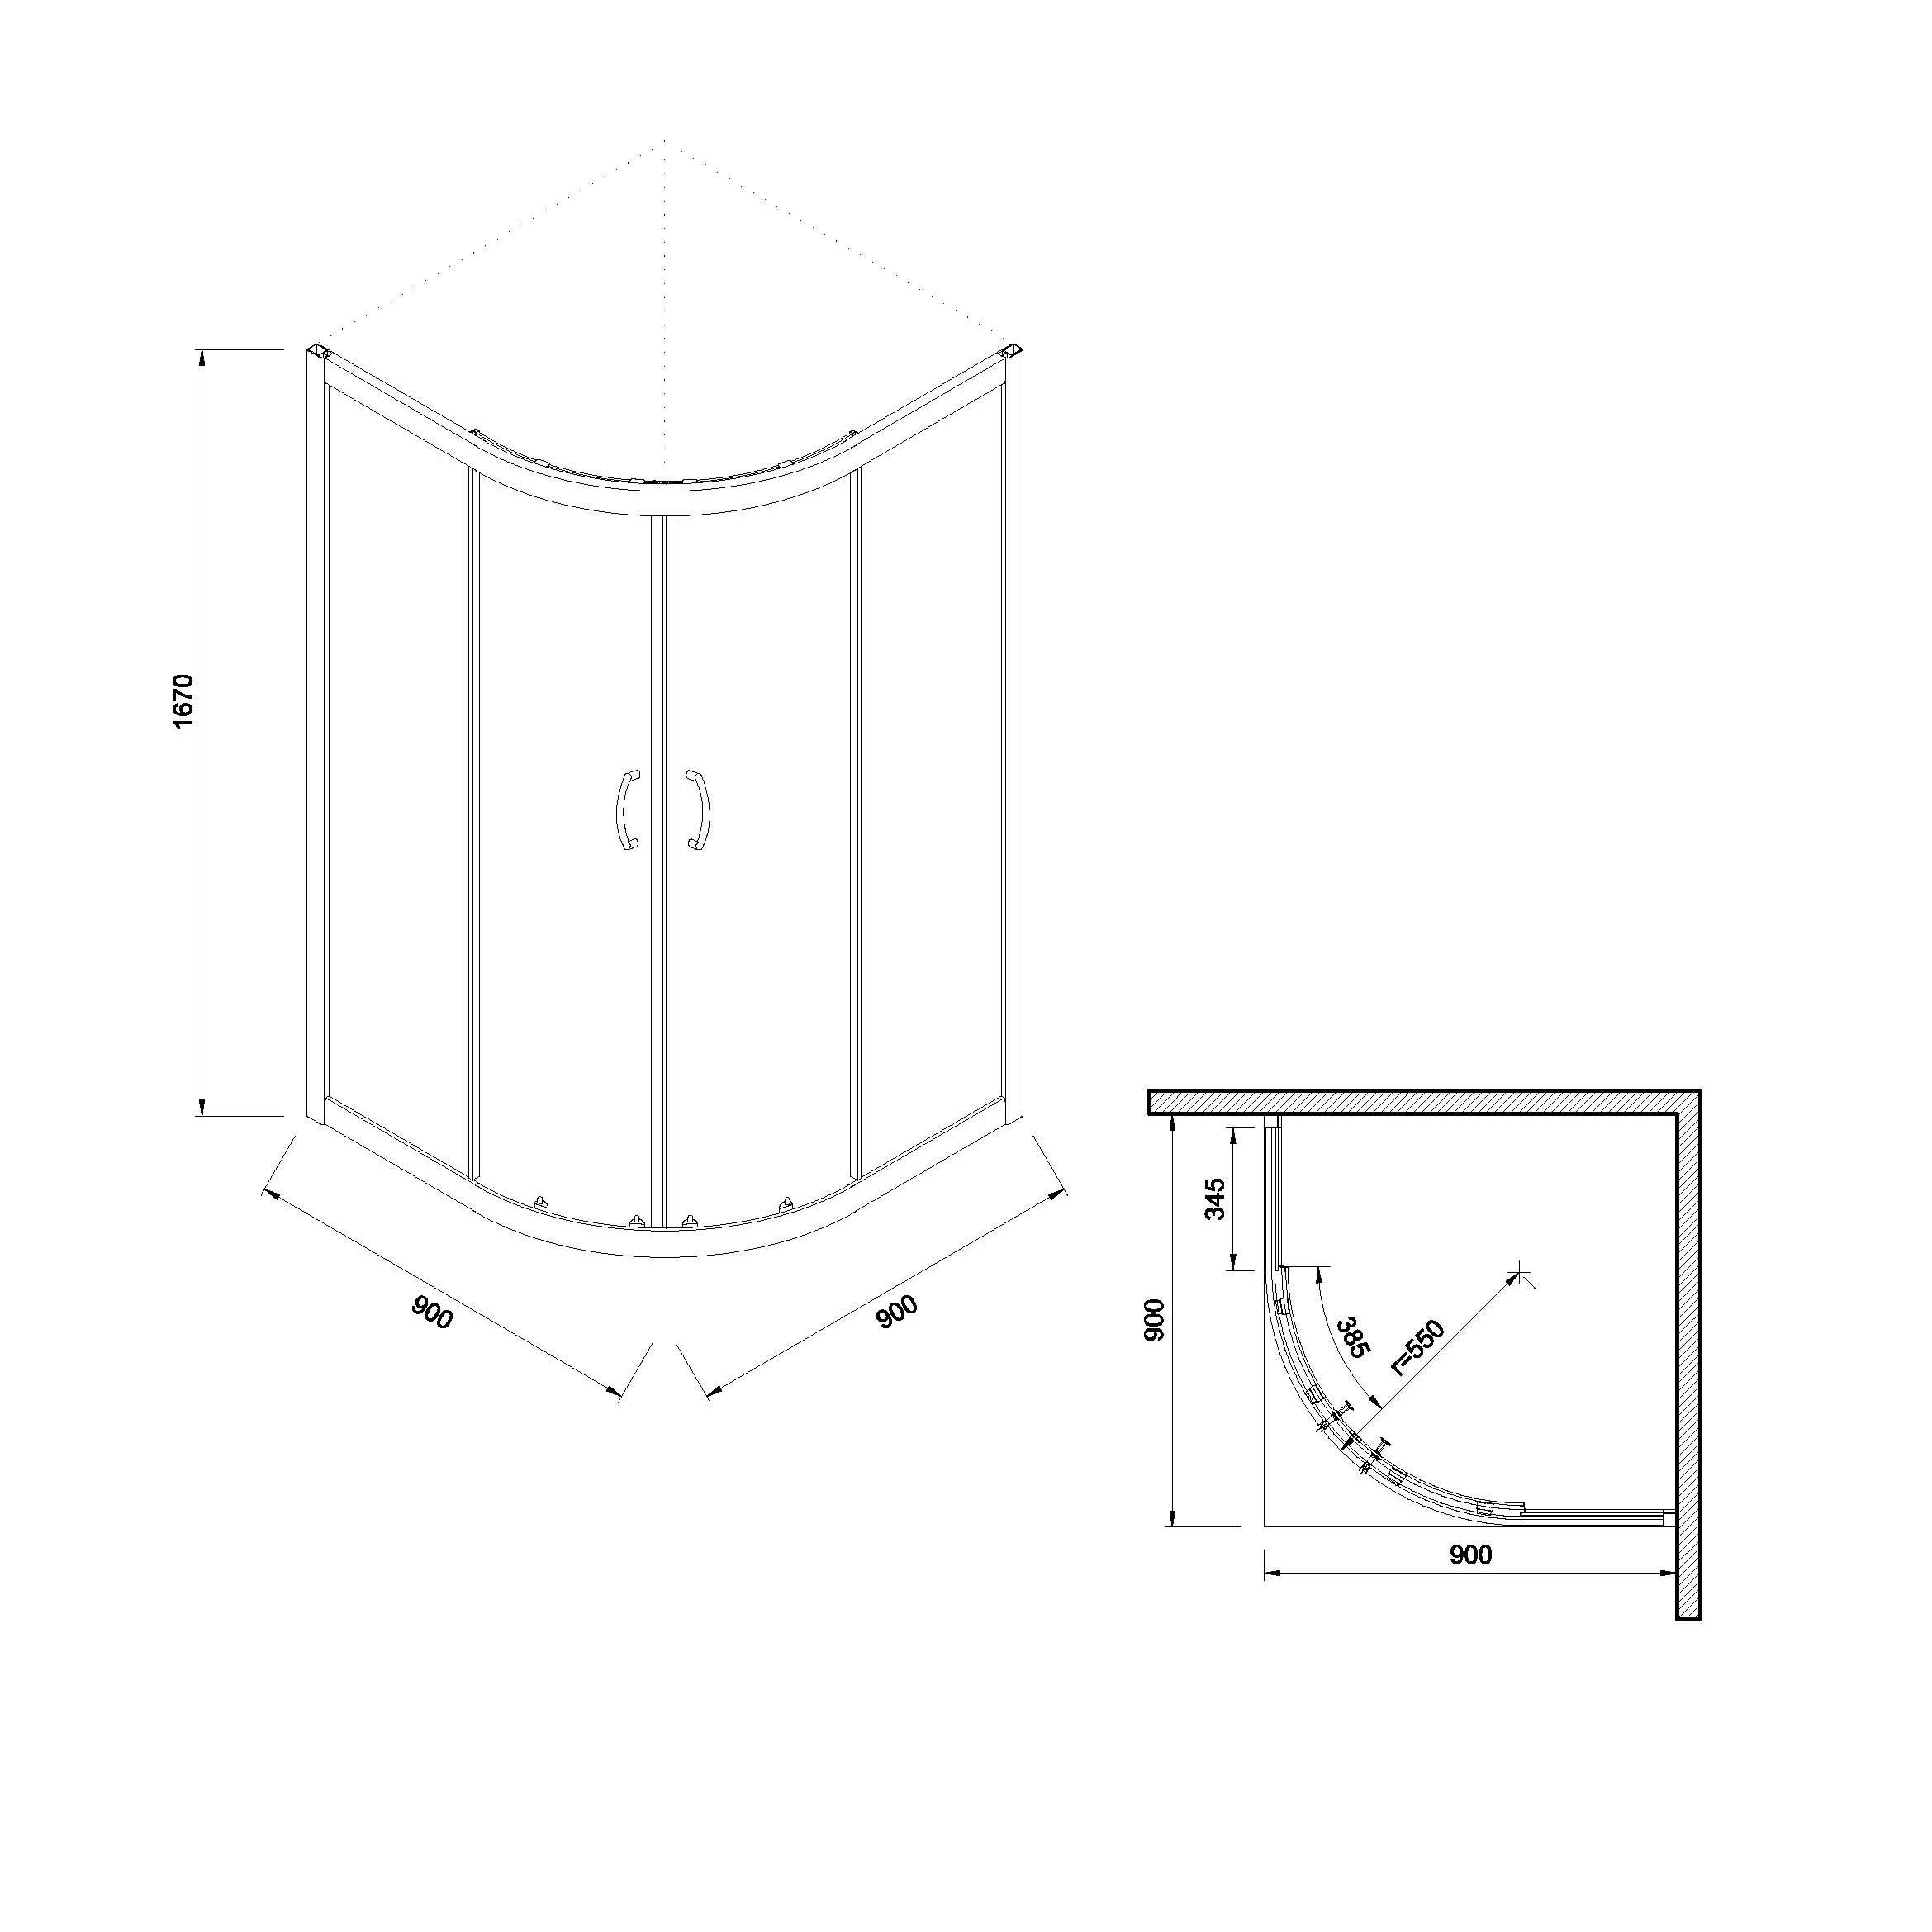 инструкция душевая кабина keramac aurora без поддона 900x900x1800 мм fabric